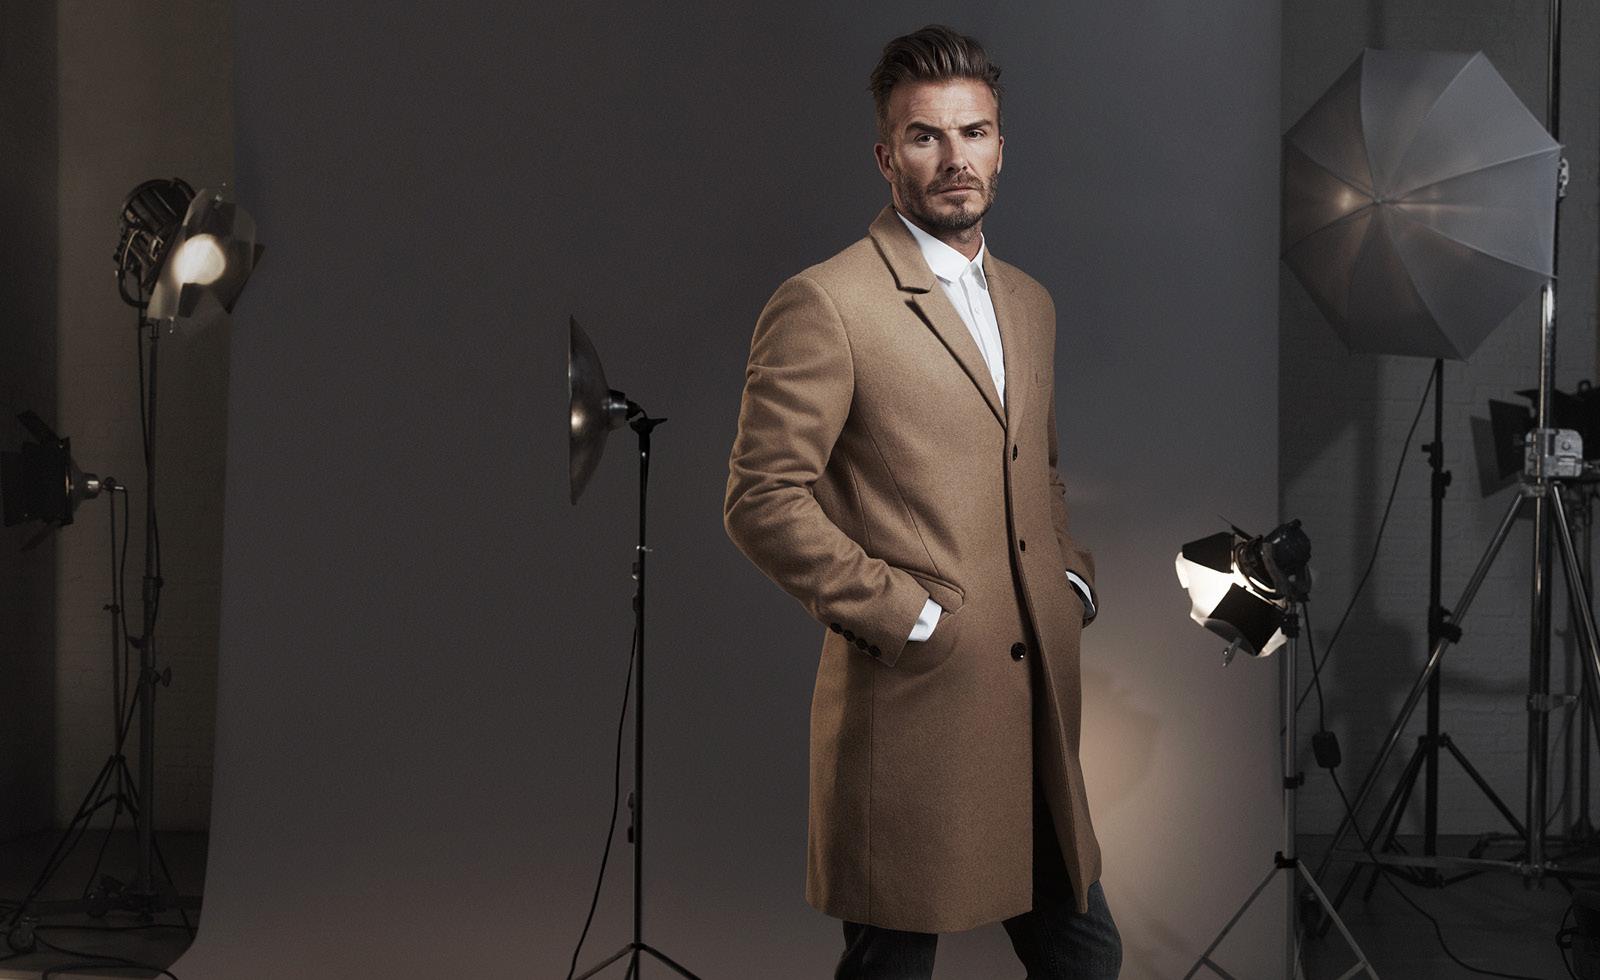 hm-modern-essentials-selected-by-david-beckham-autumn-fashion-2015-05